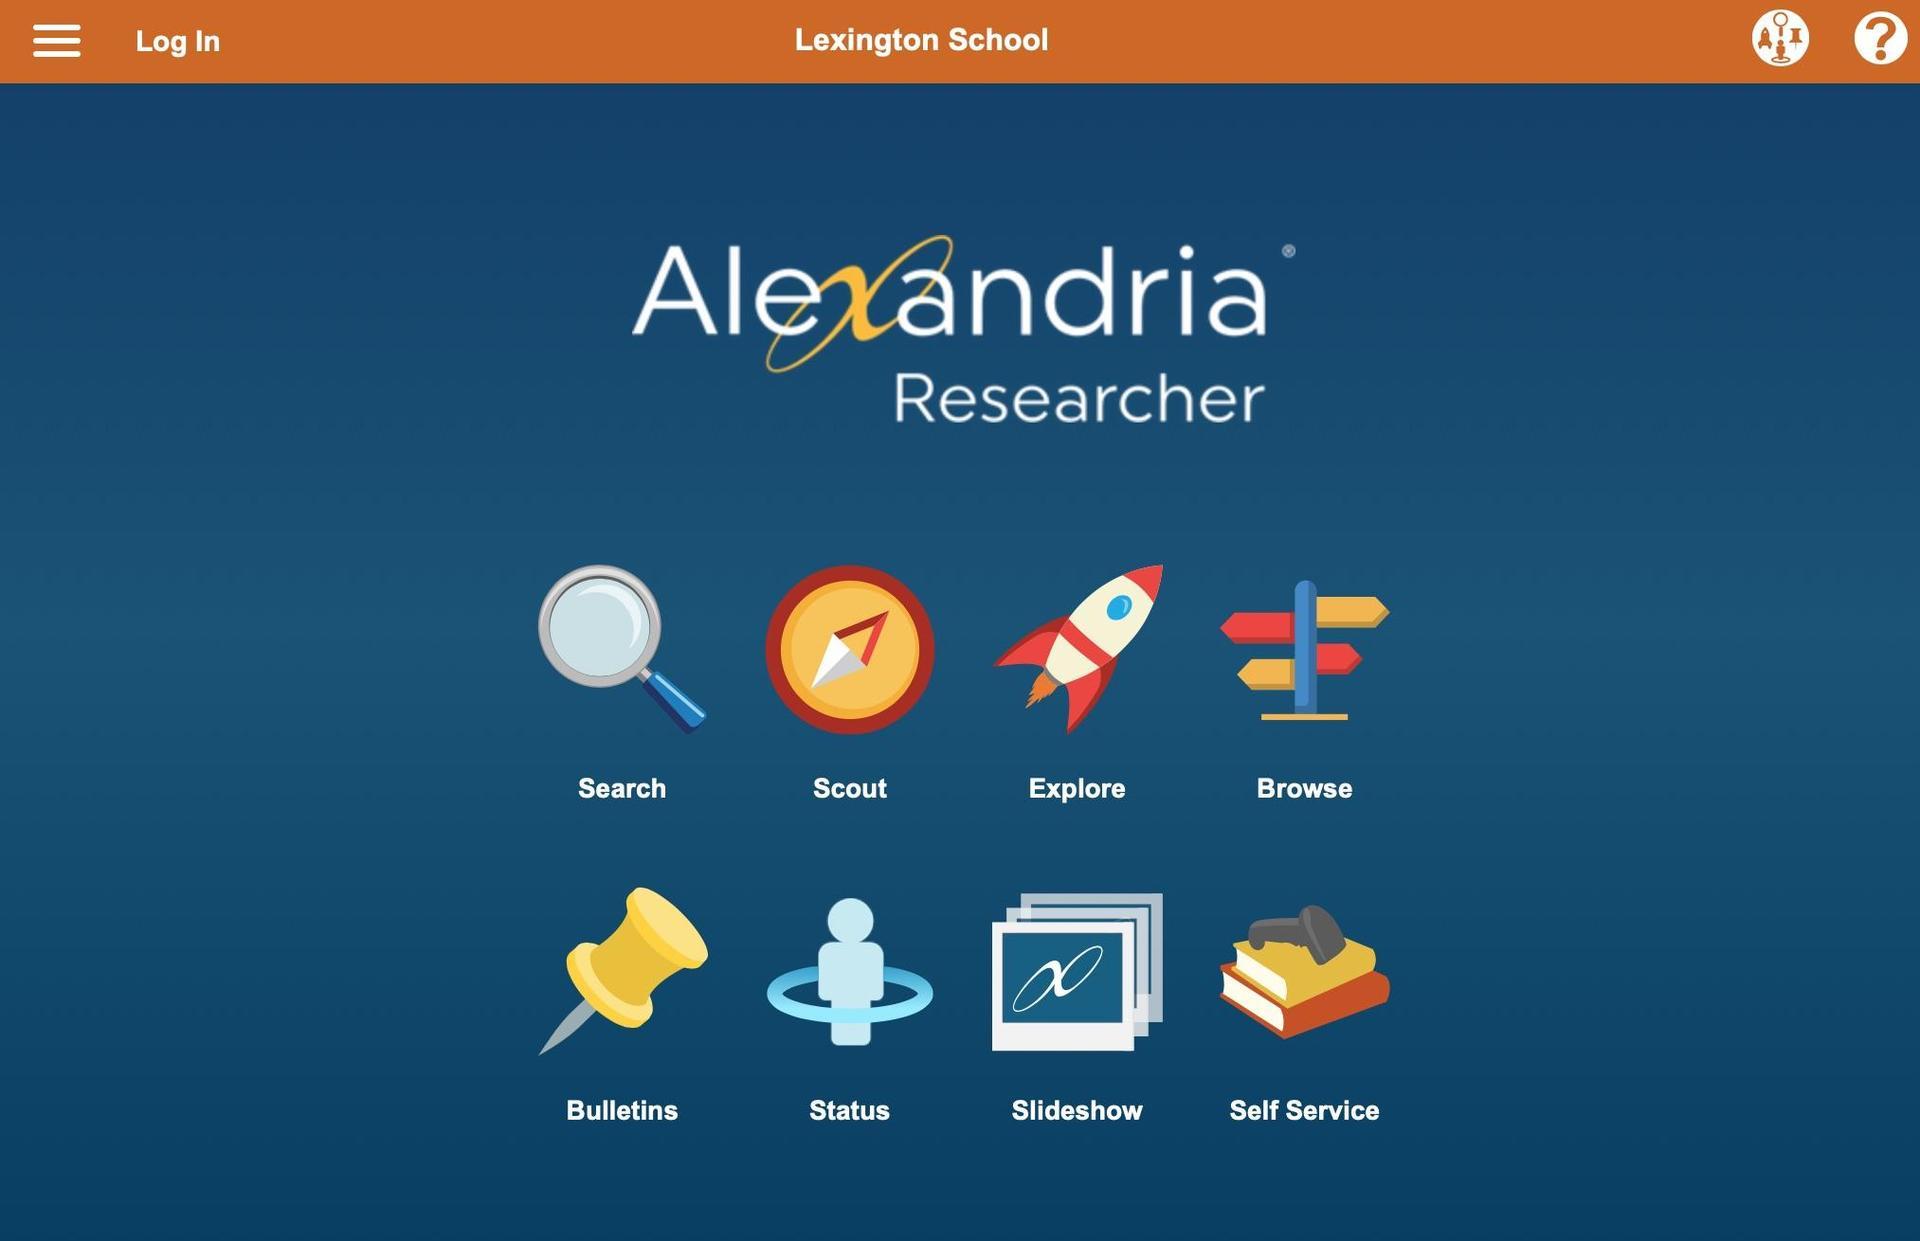 Alexandria home page